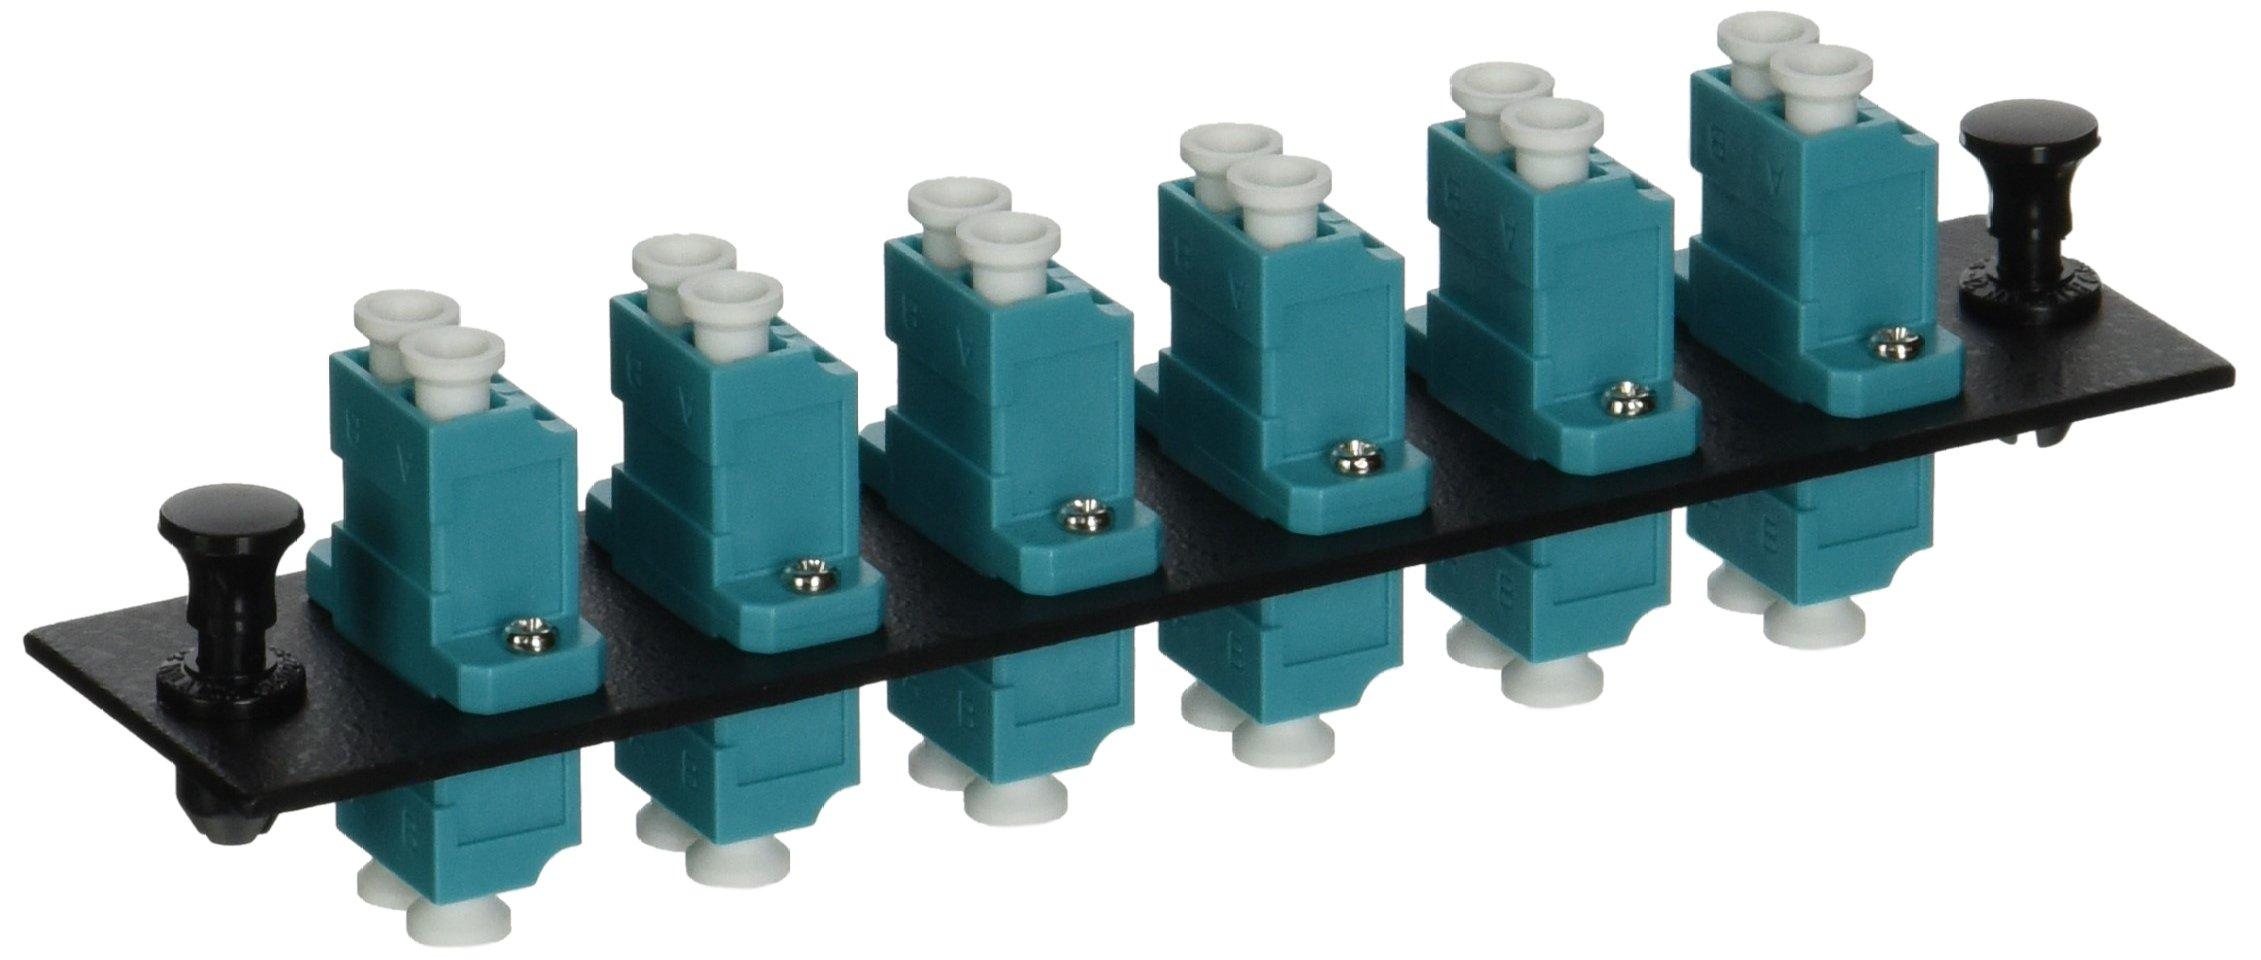 Hubbell HUBFSPLCDM6AQ Adapter Panel, 12-Fiber, 6 LC Duplex, Phosphor Bronze, Aqua